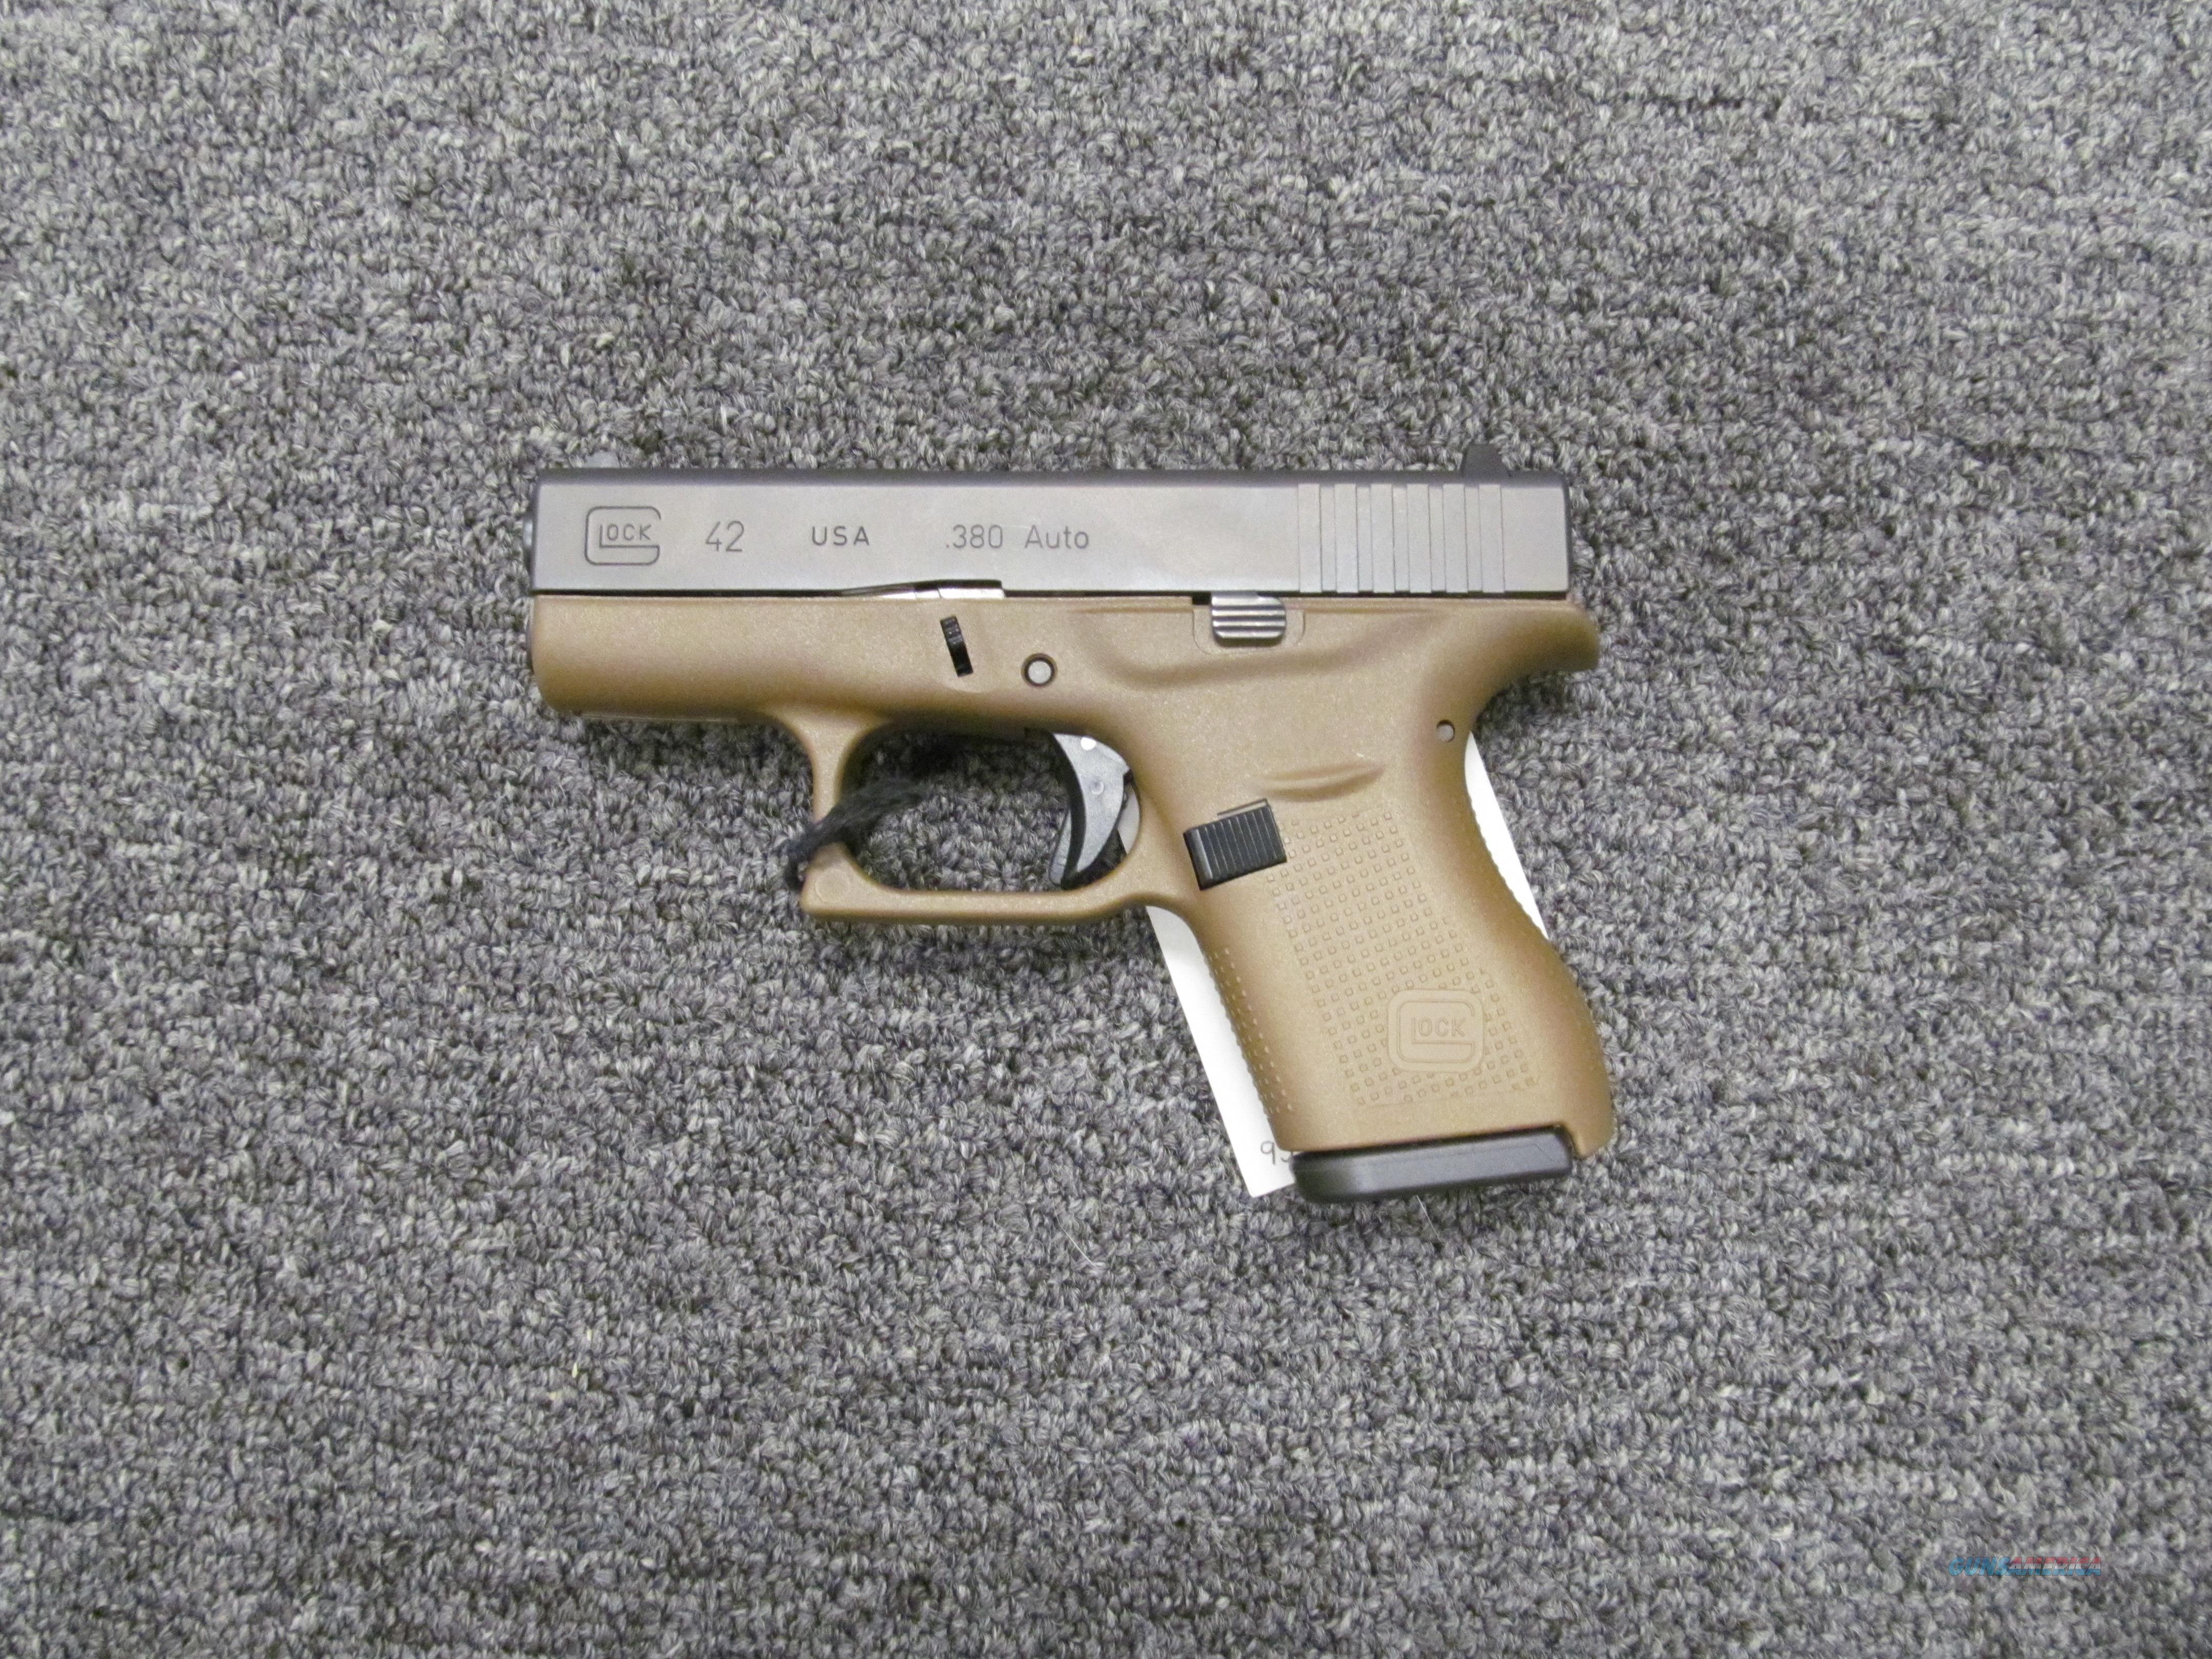 Glock 42 FDE  Guns > Pistols > Glock Pistols > 42